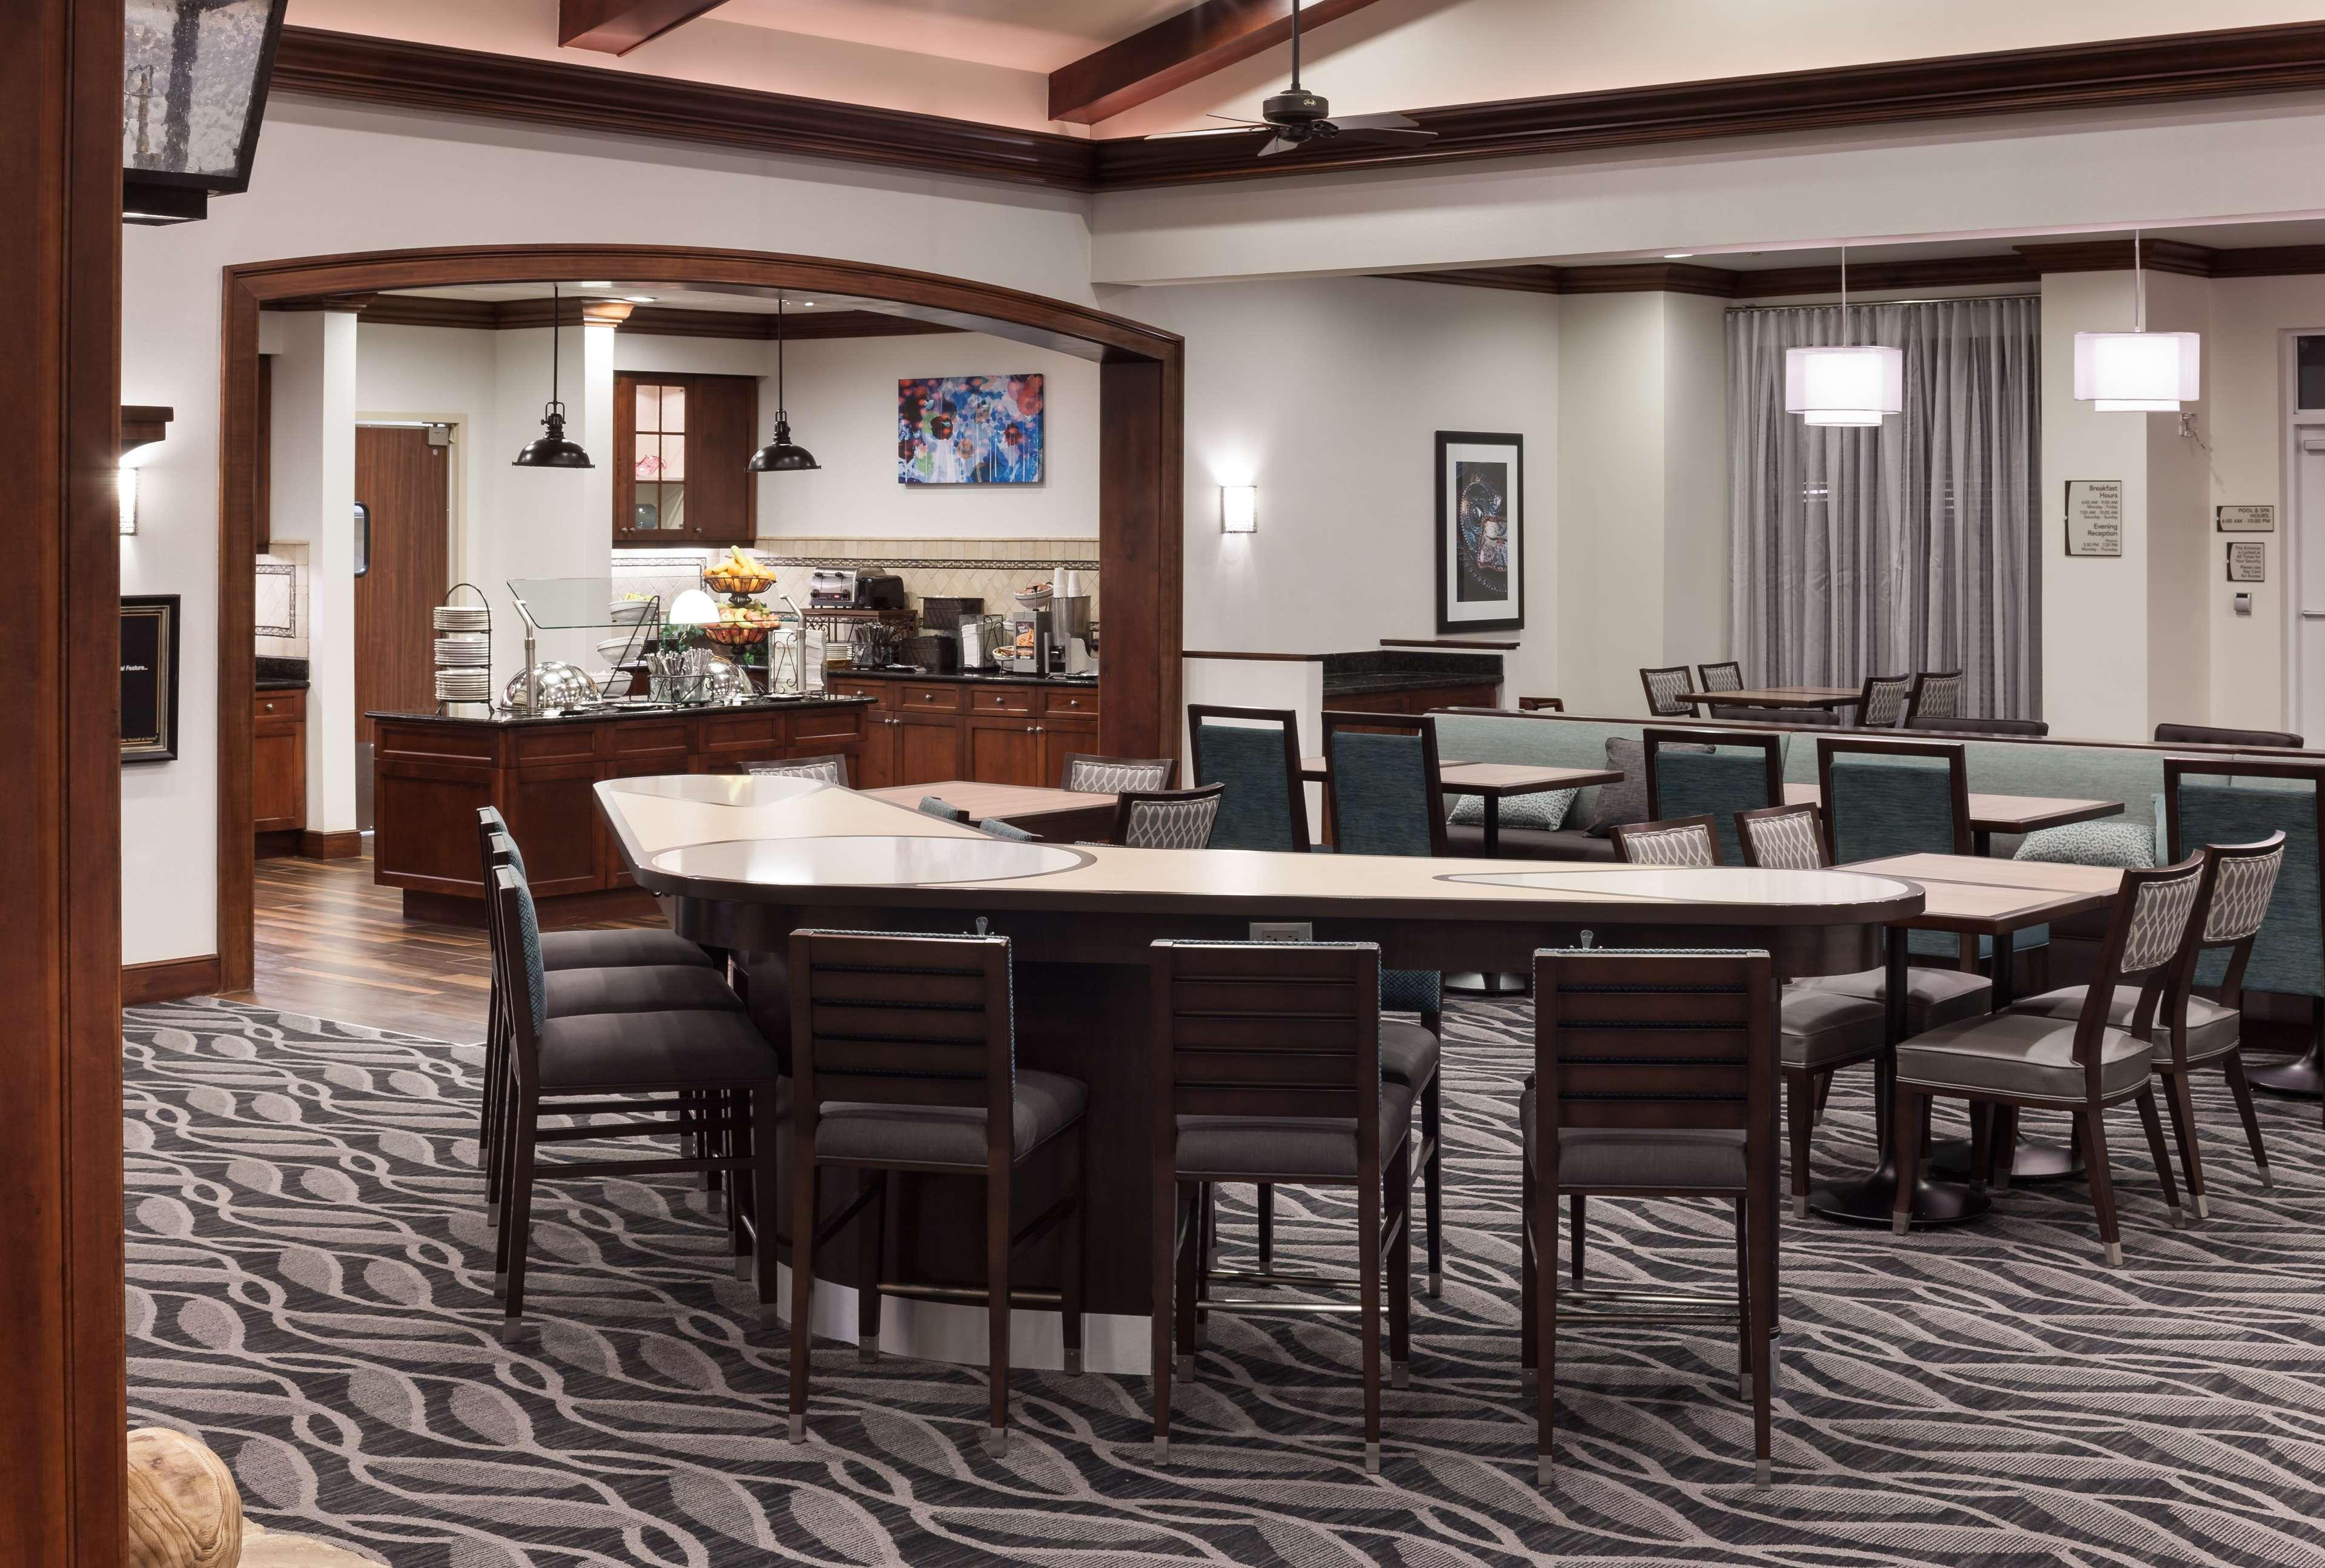 Homewood Suites by Hilton Denton image 4